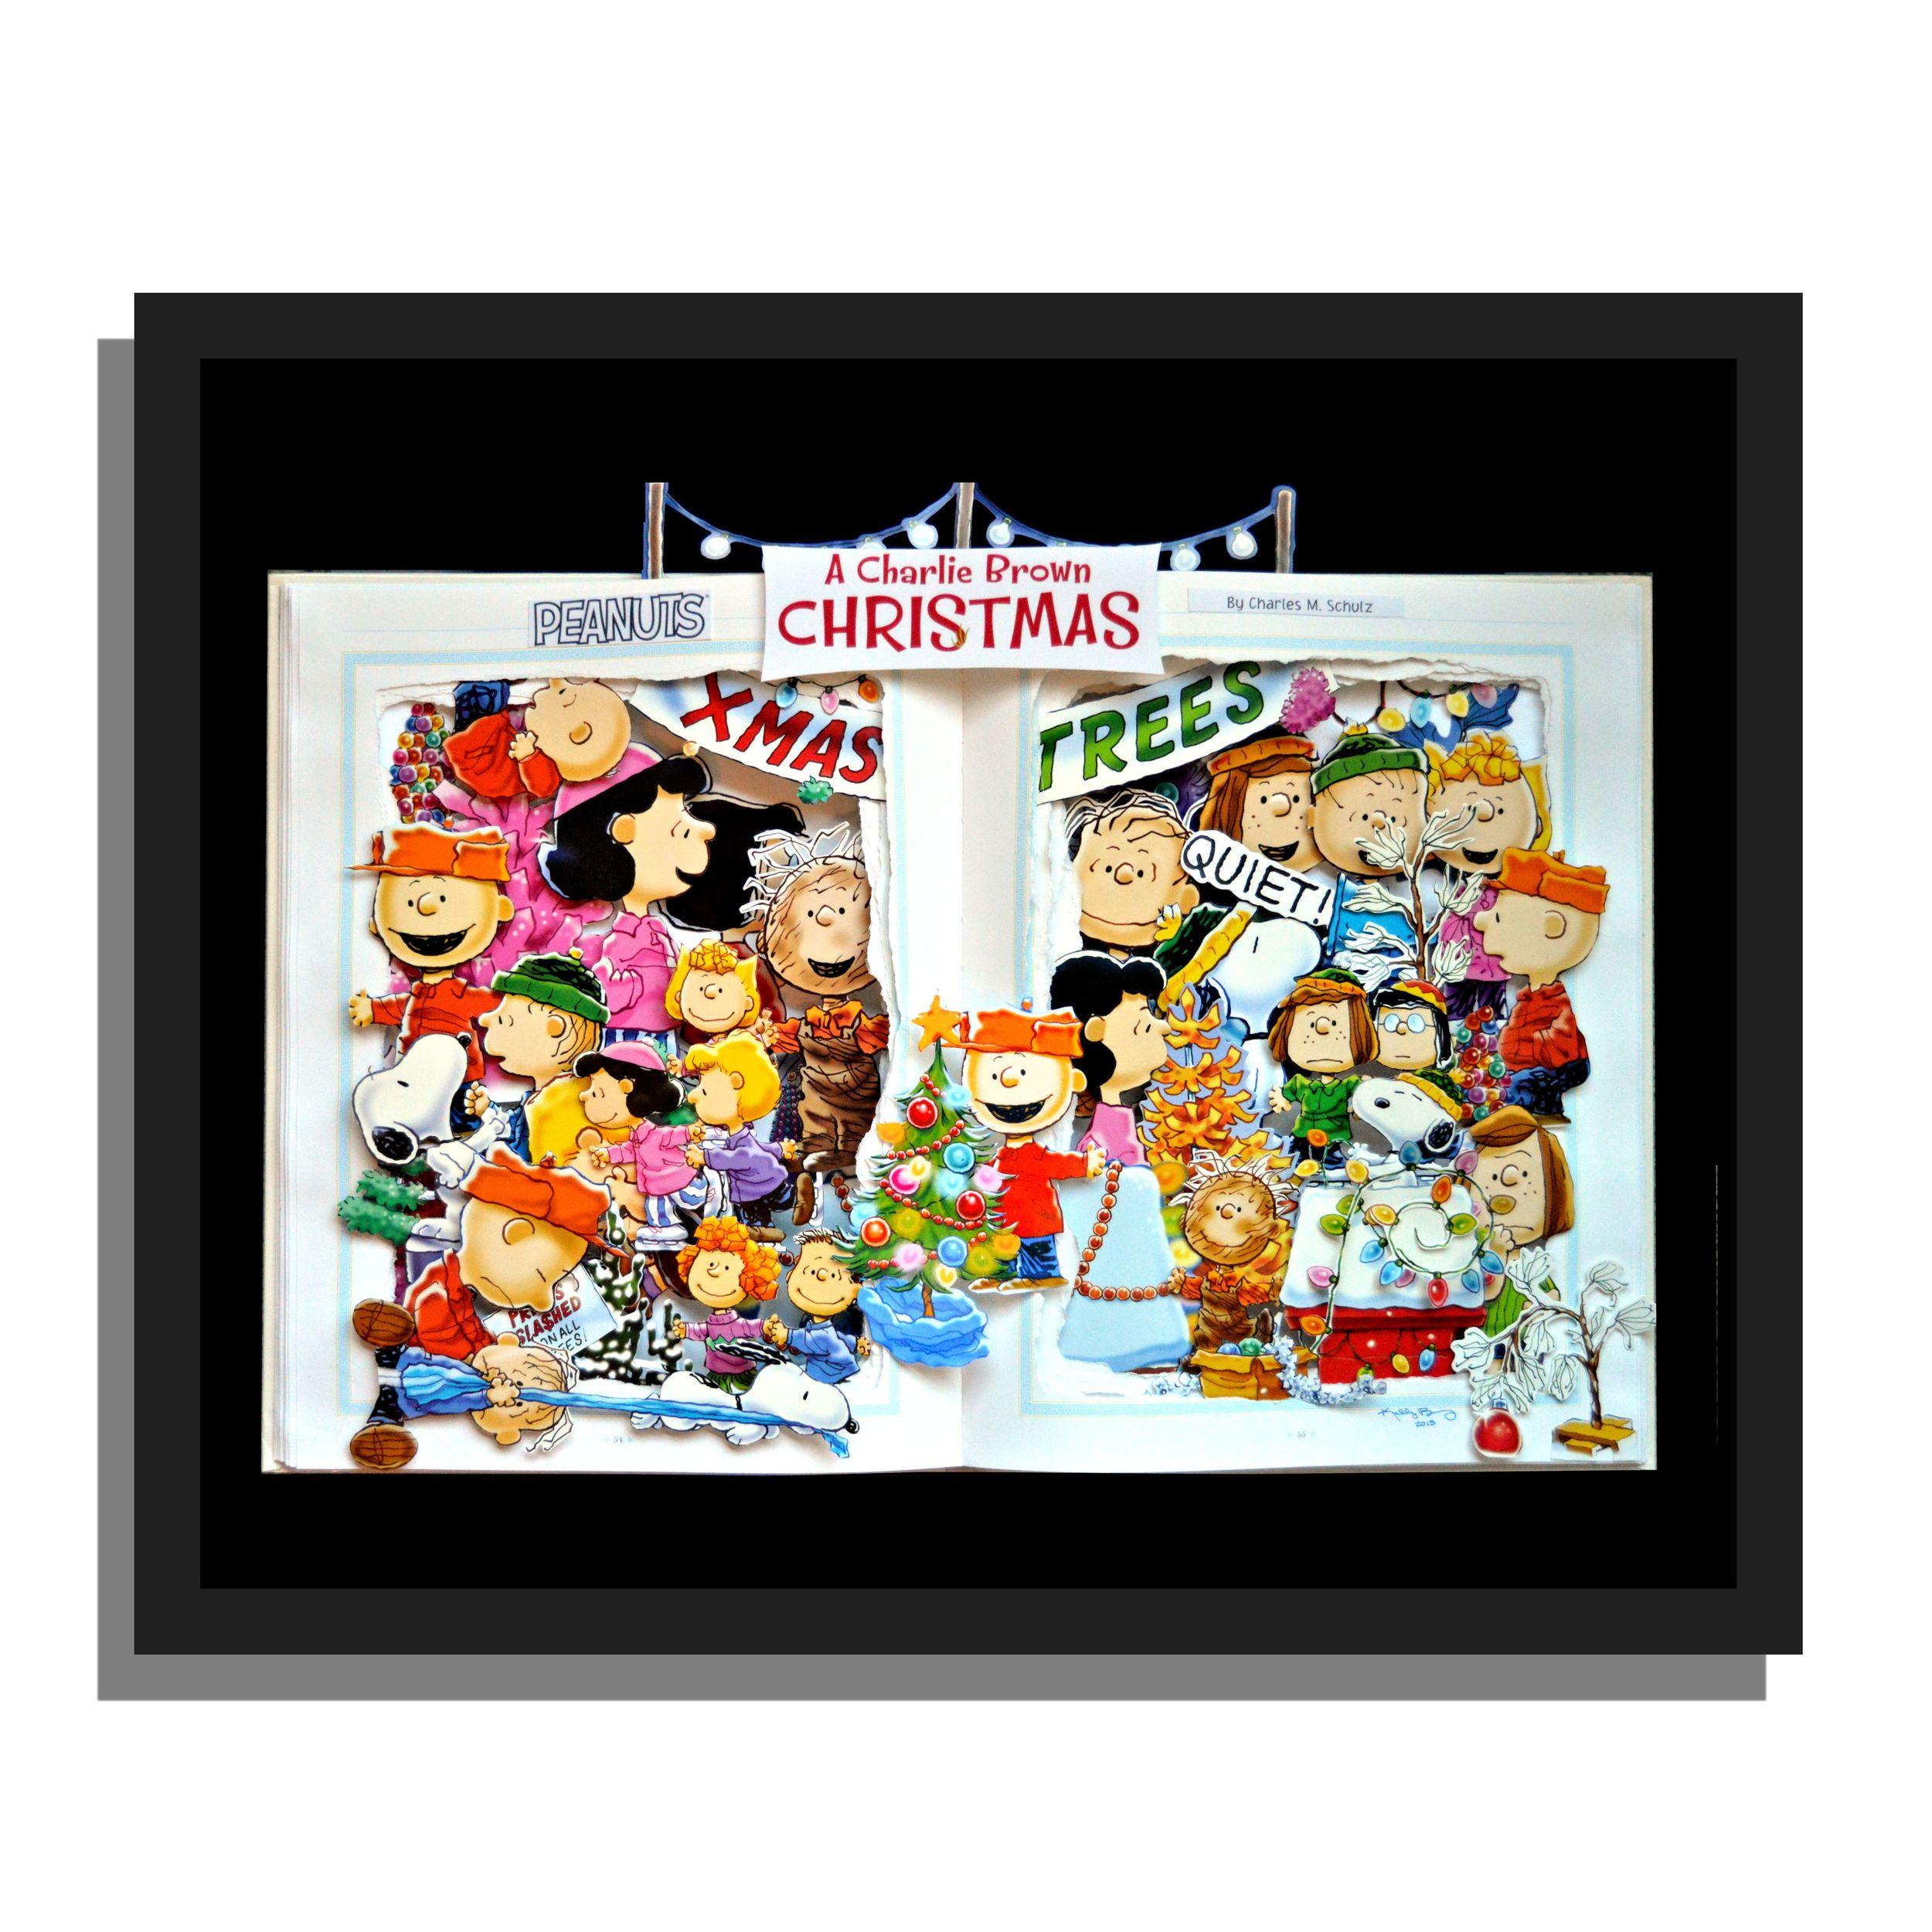 Charlie Brown Christmas - 16x20x3 Book Sculpture - Custom Order